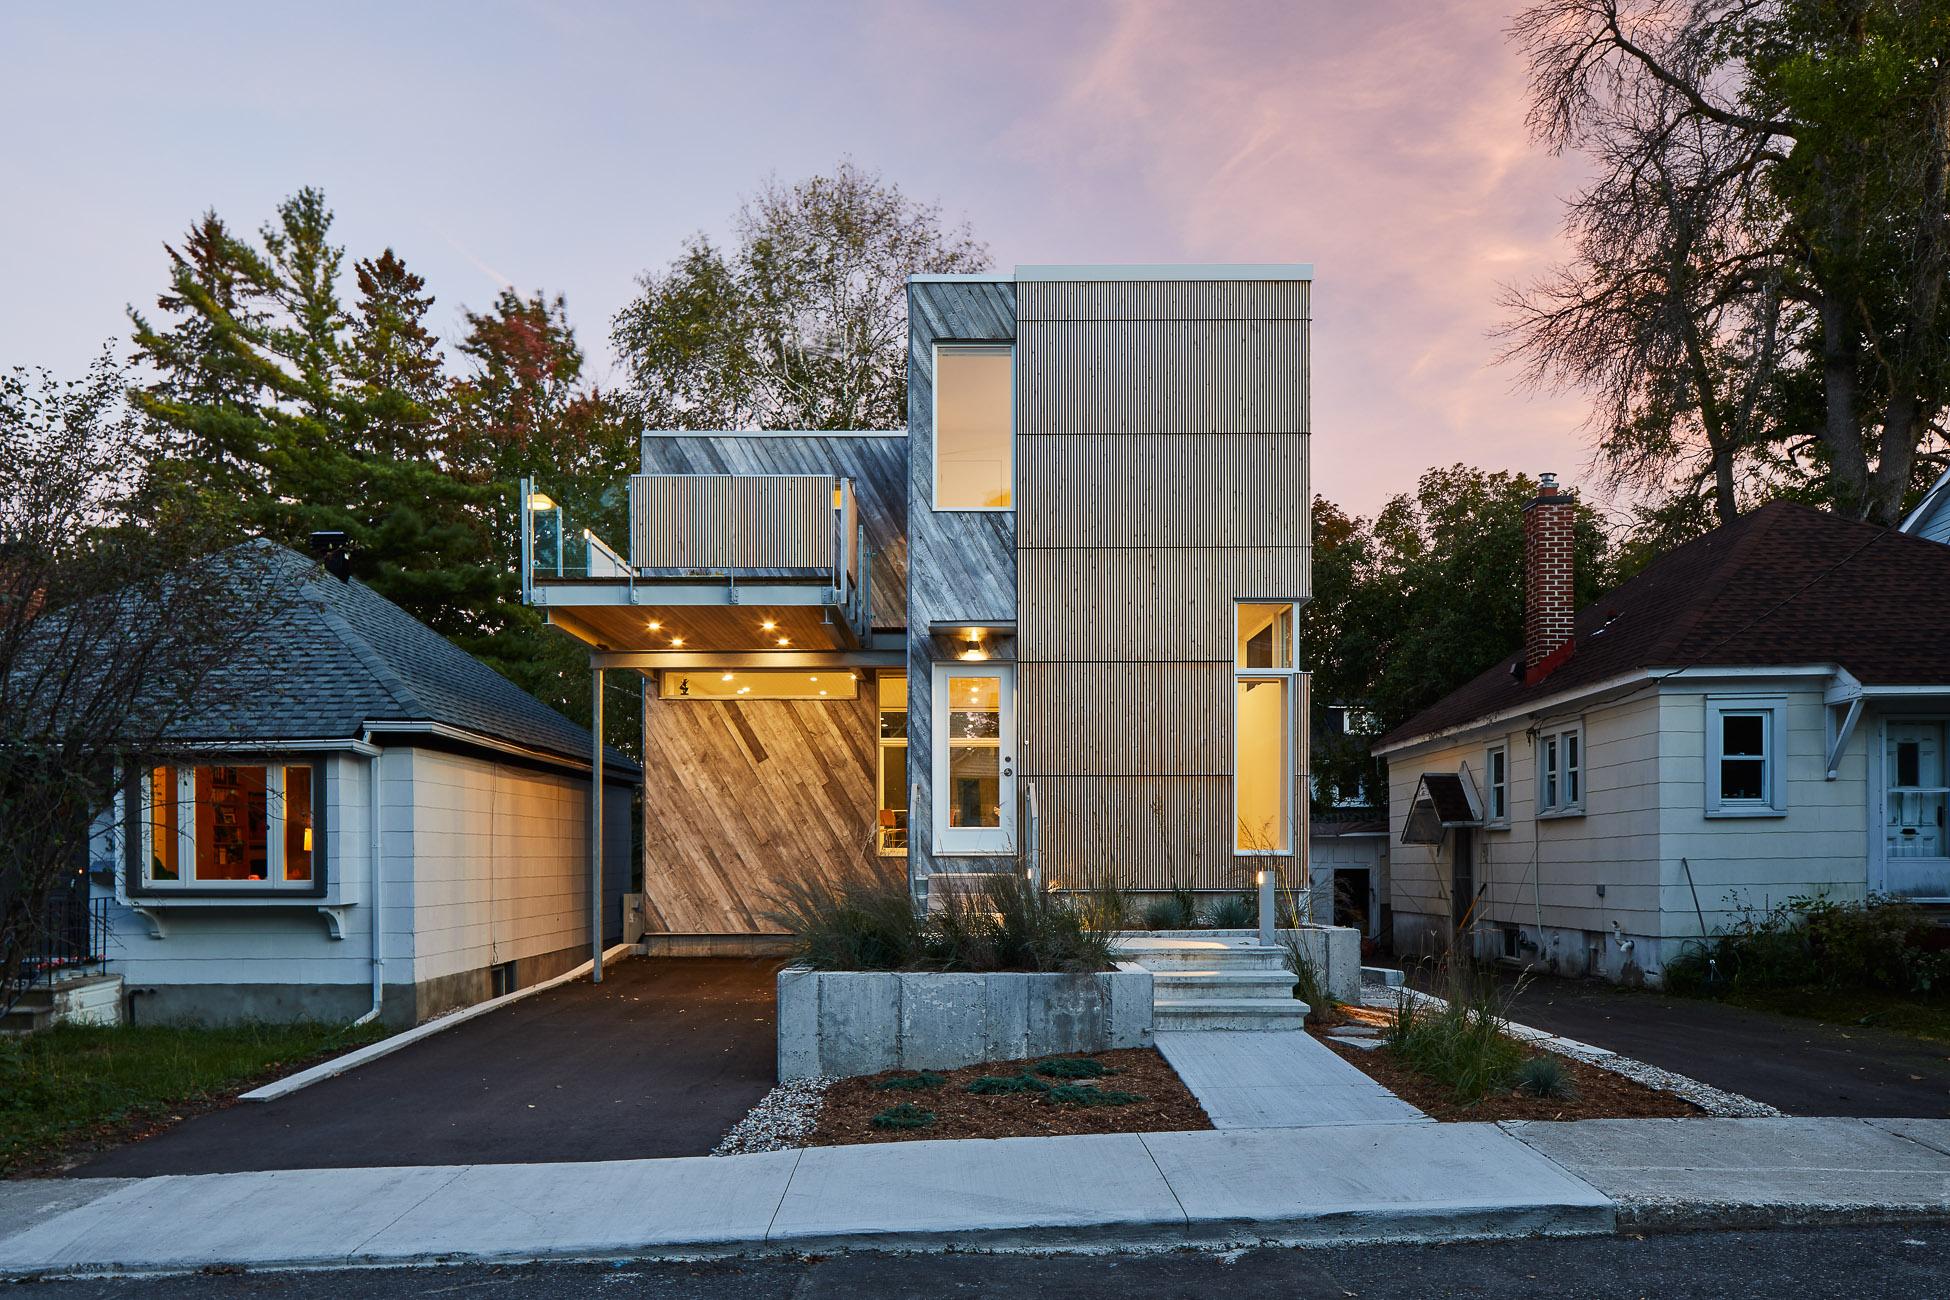 044-Shean Architects Fentiman.jpg